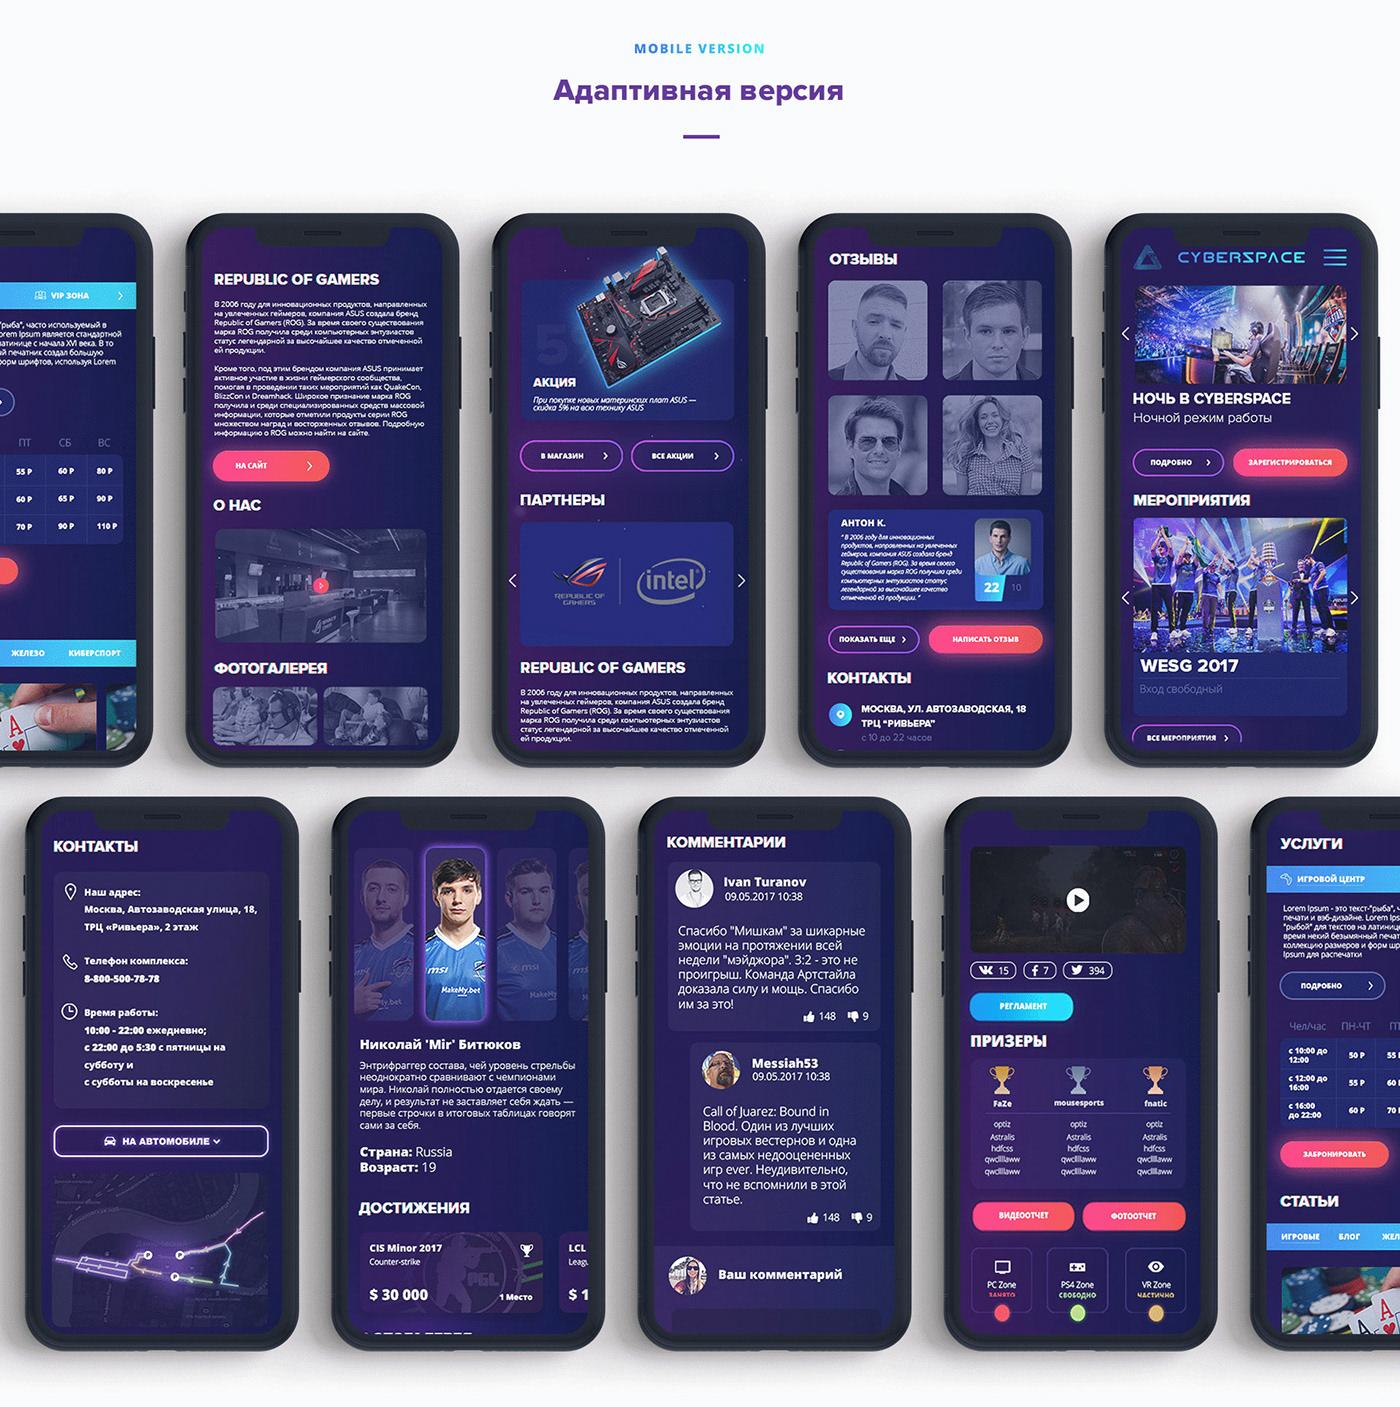 Cyberspace maxseva95 Adaptive UI ux design